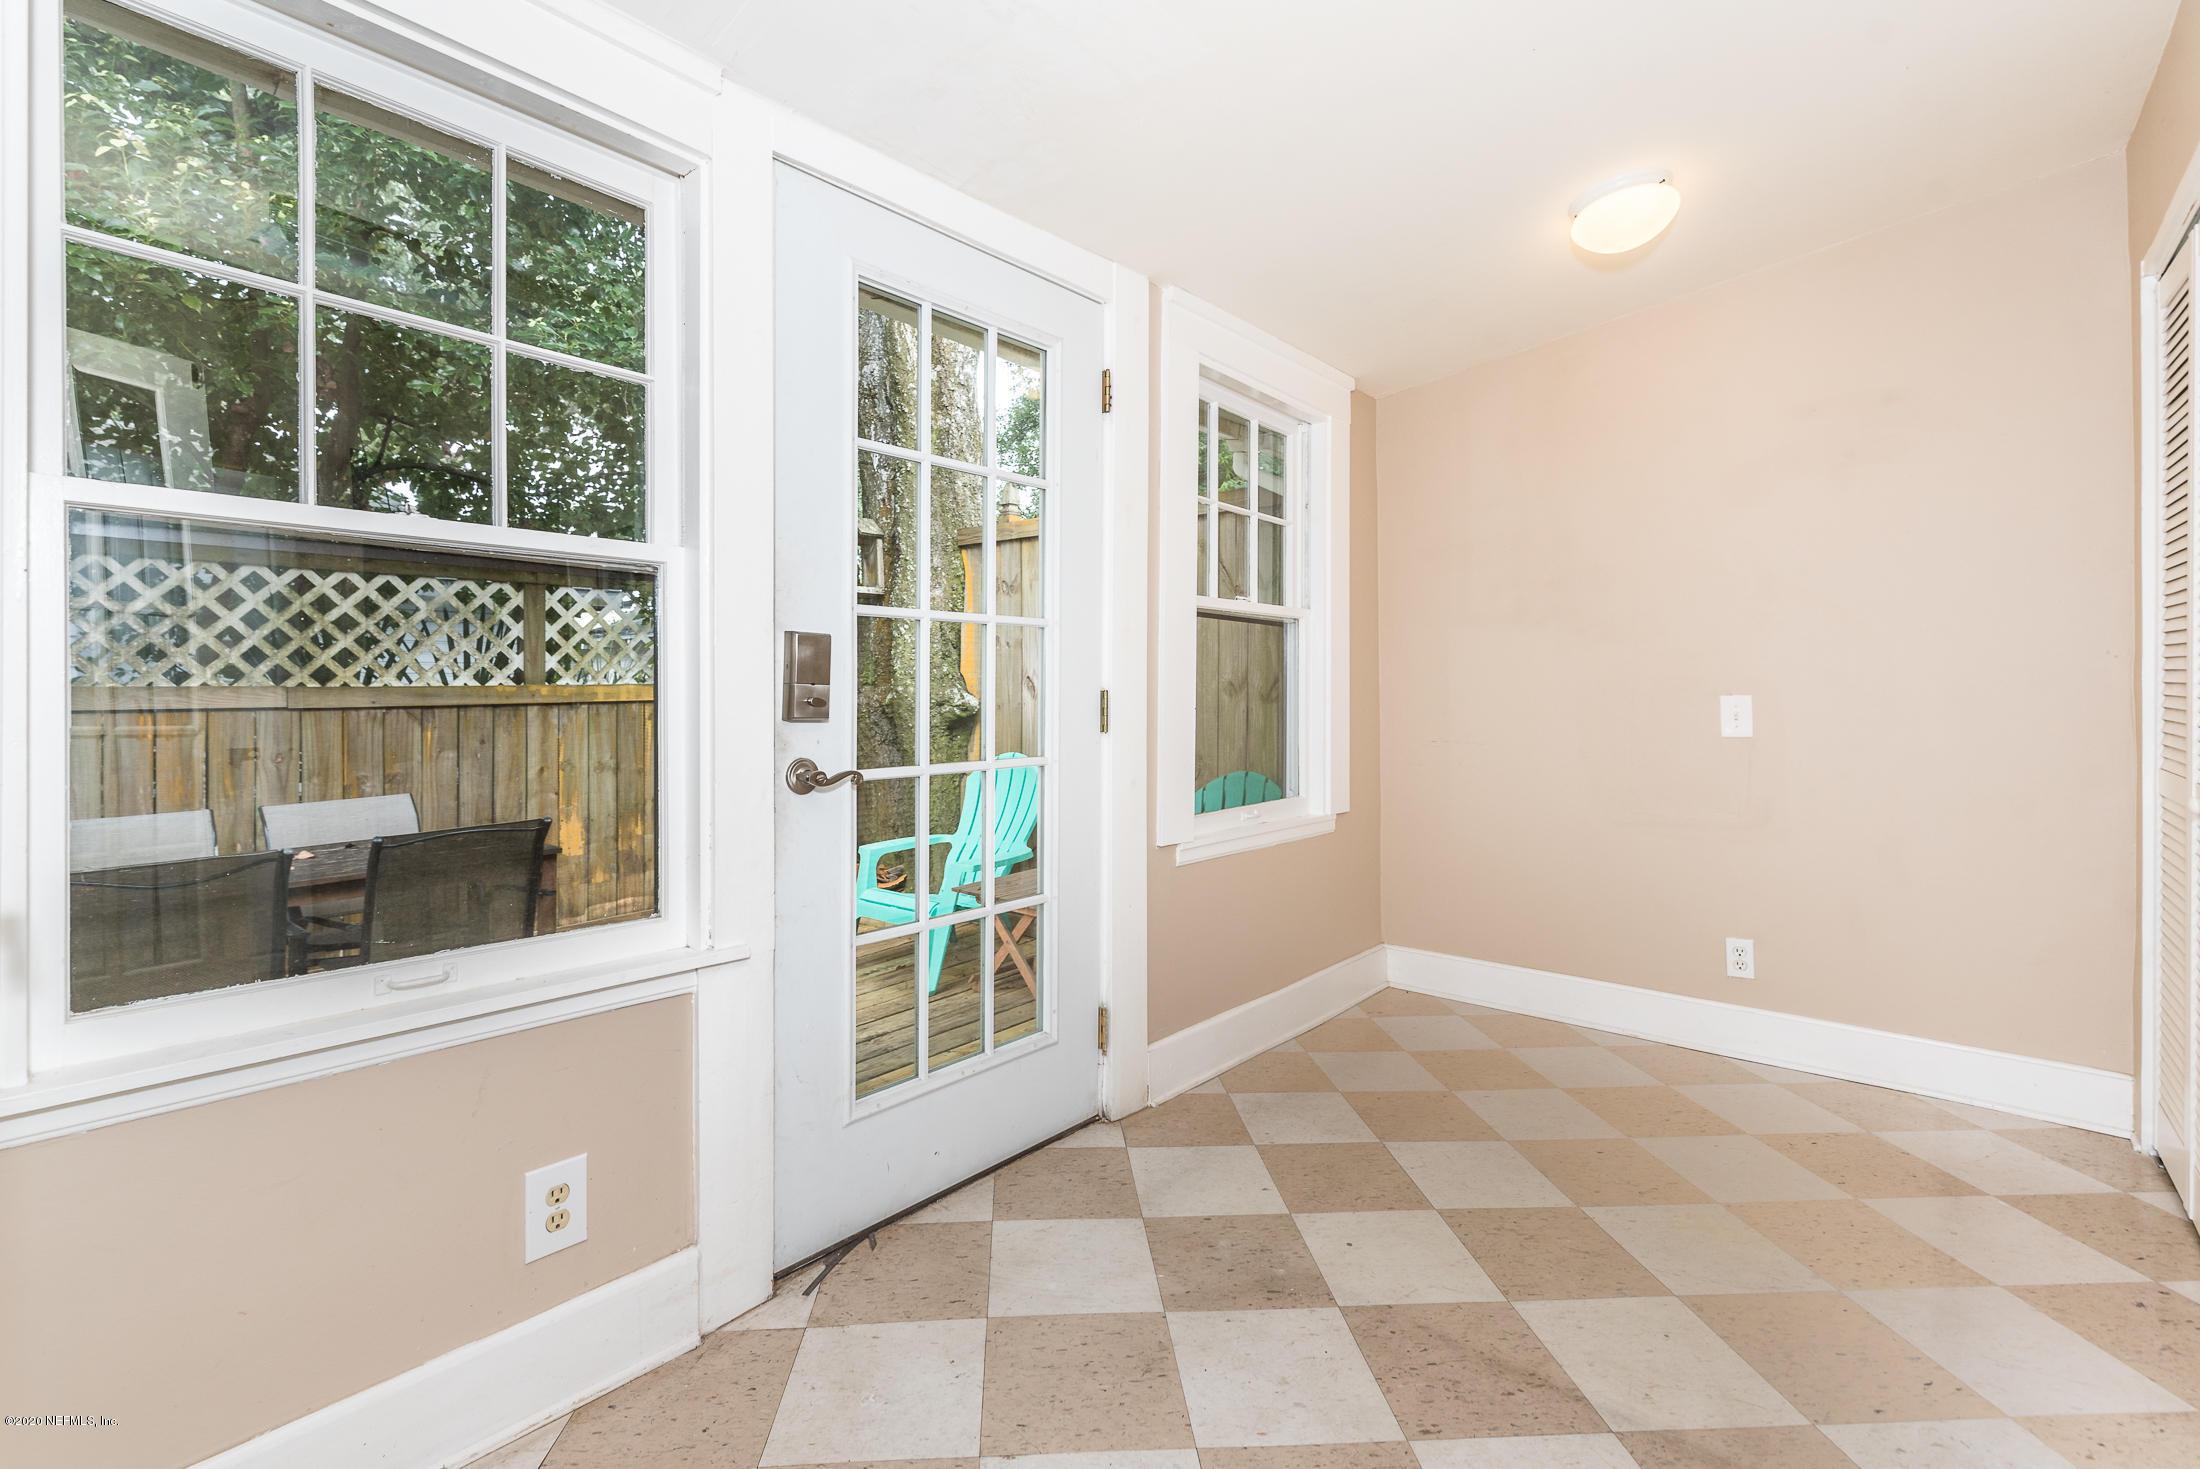 65 SARAGOSSA, ST AUGUSTINE, FLORIDA 32084, 4 Bedrooms Bedrooms, ,2 BathroomsBathrooms,Residential,For sale,SARAGOSSA,1056602